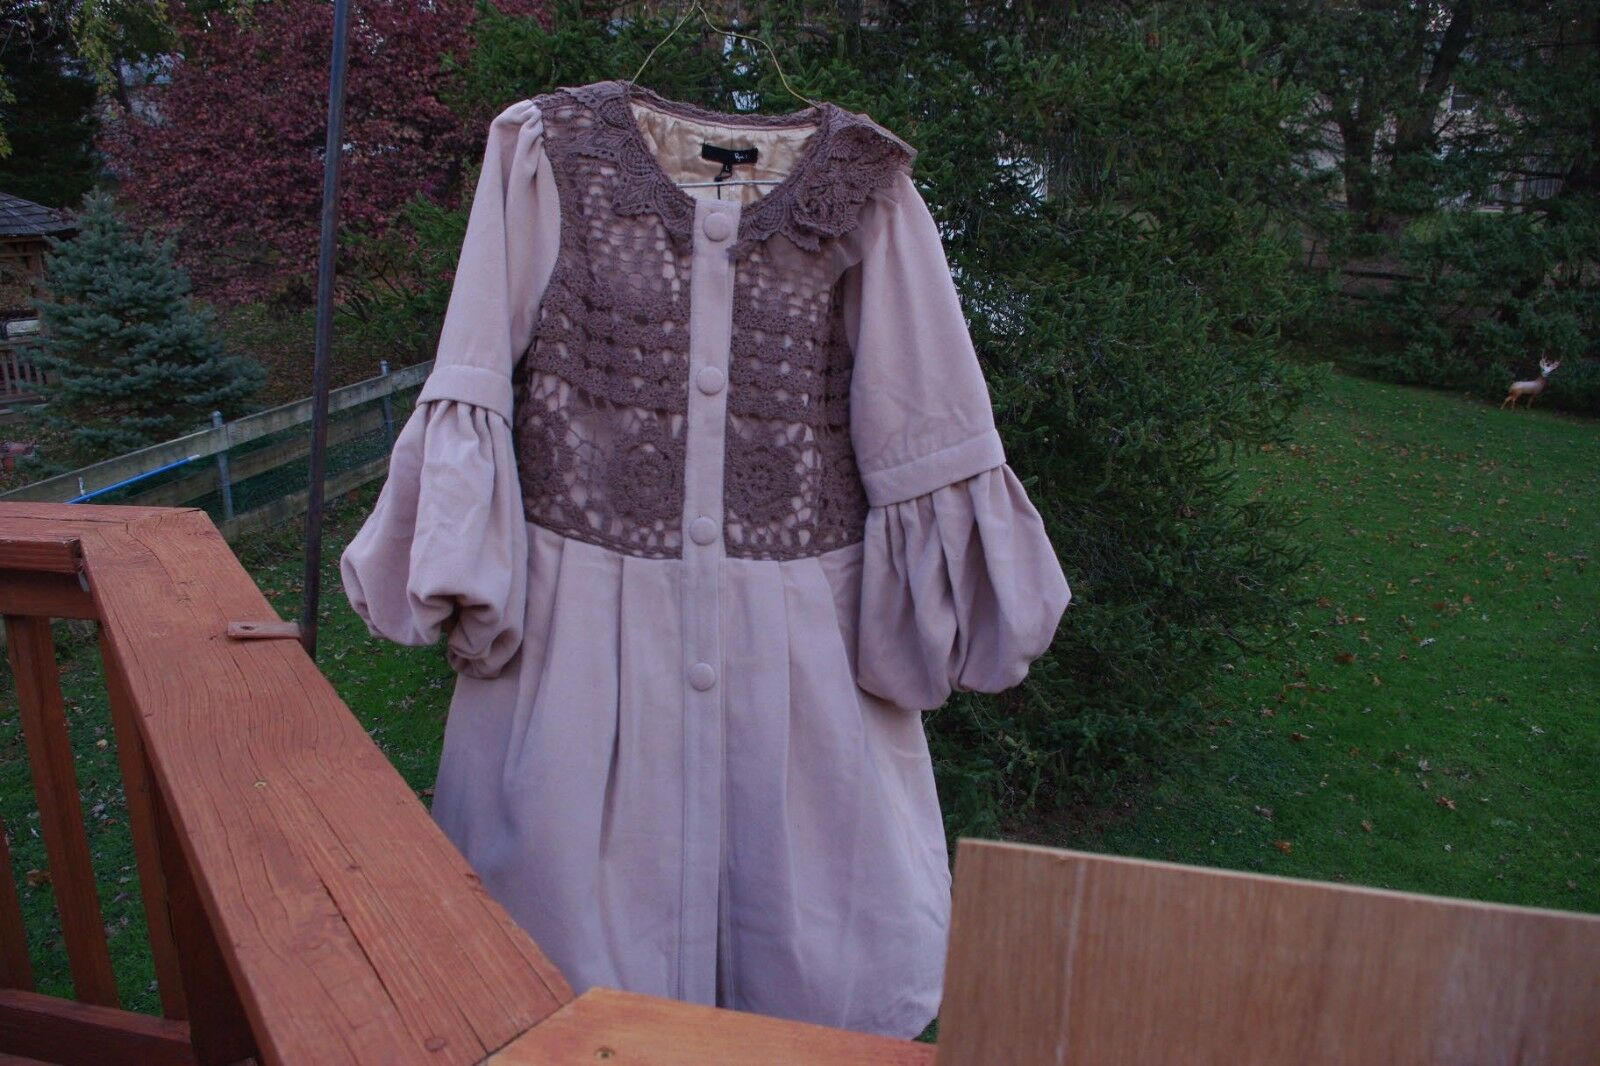 NWT RYU Coat Light Tan w  Brown Crochet Bodice & Collar 3 4 Puff Sleeves Large